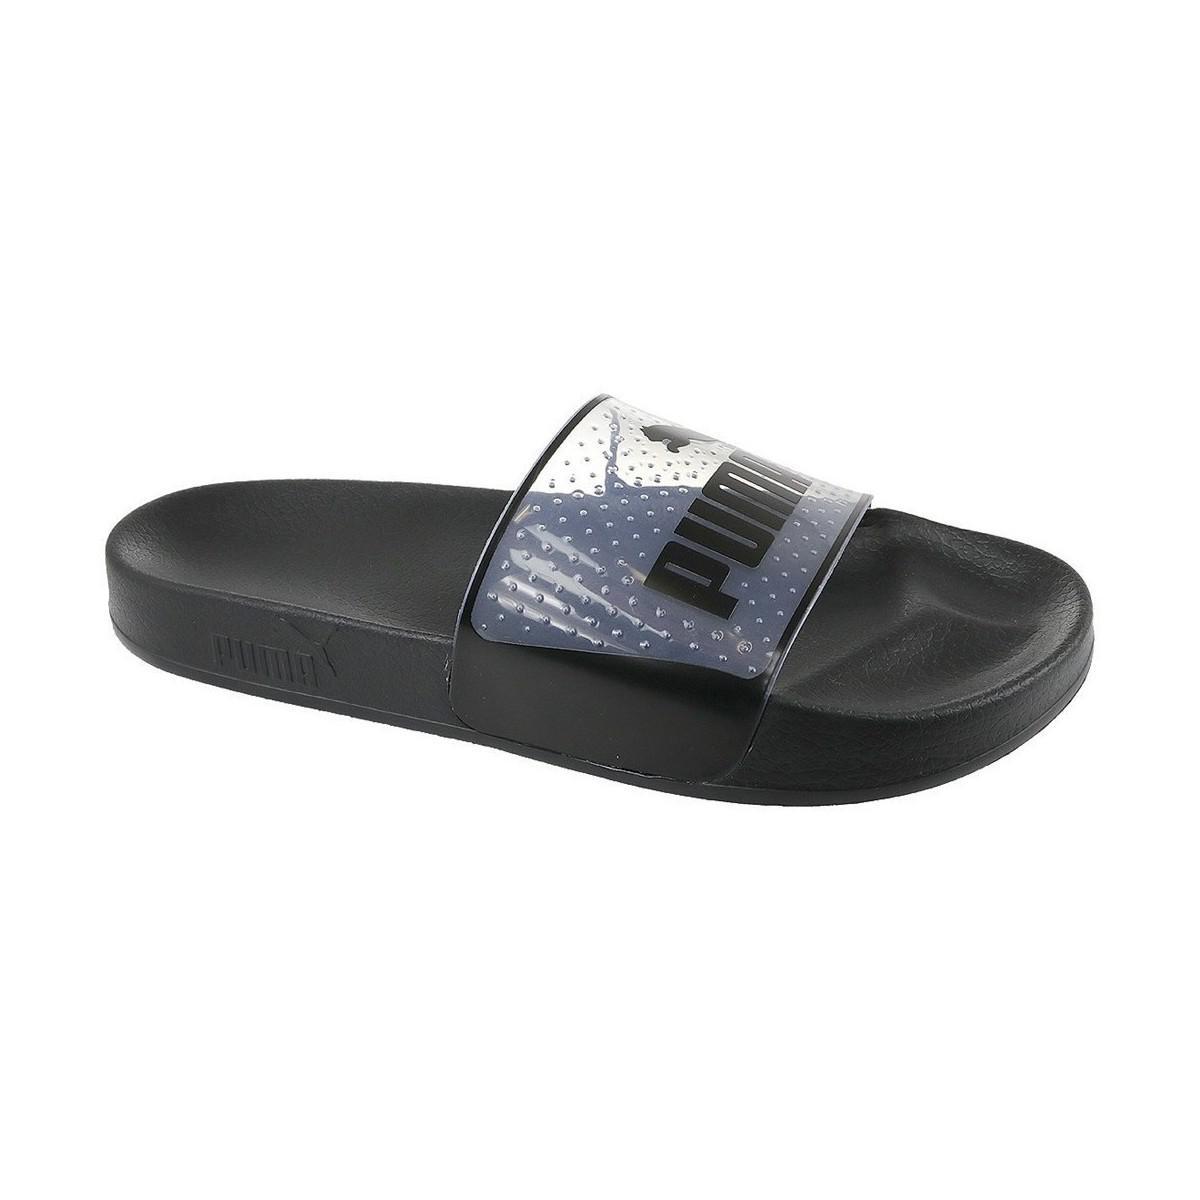 177991b8fad0 PUMA Leadcat Jelly Women s Mules   Casual Shoes In Black in Black ...